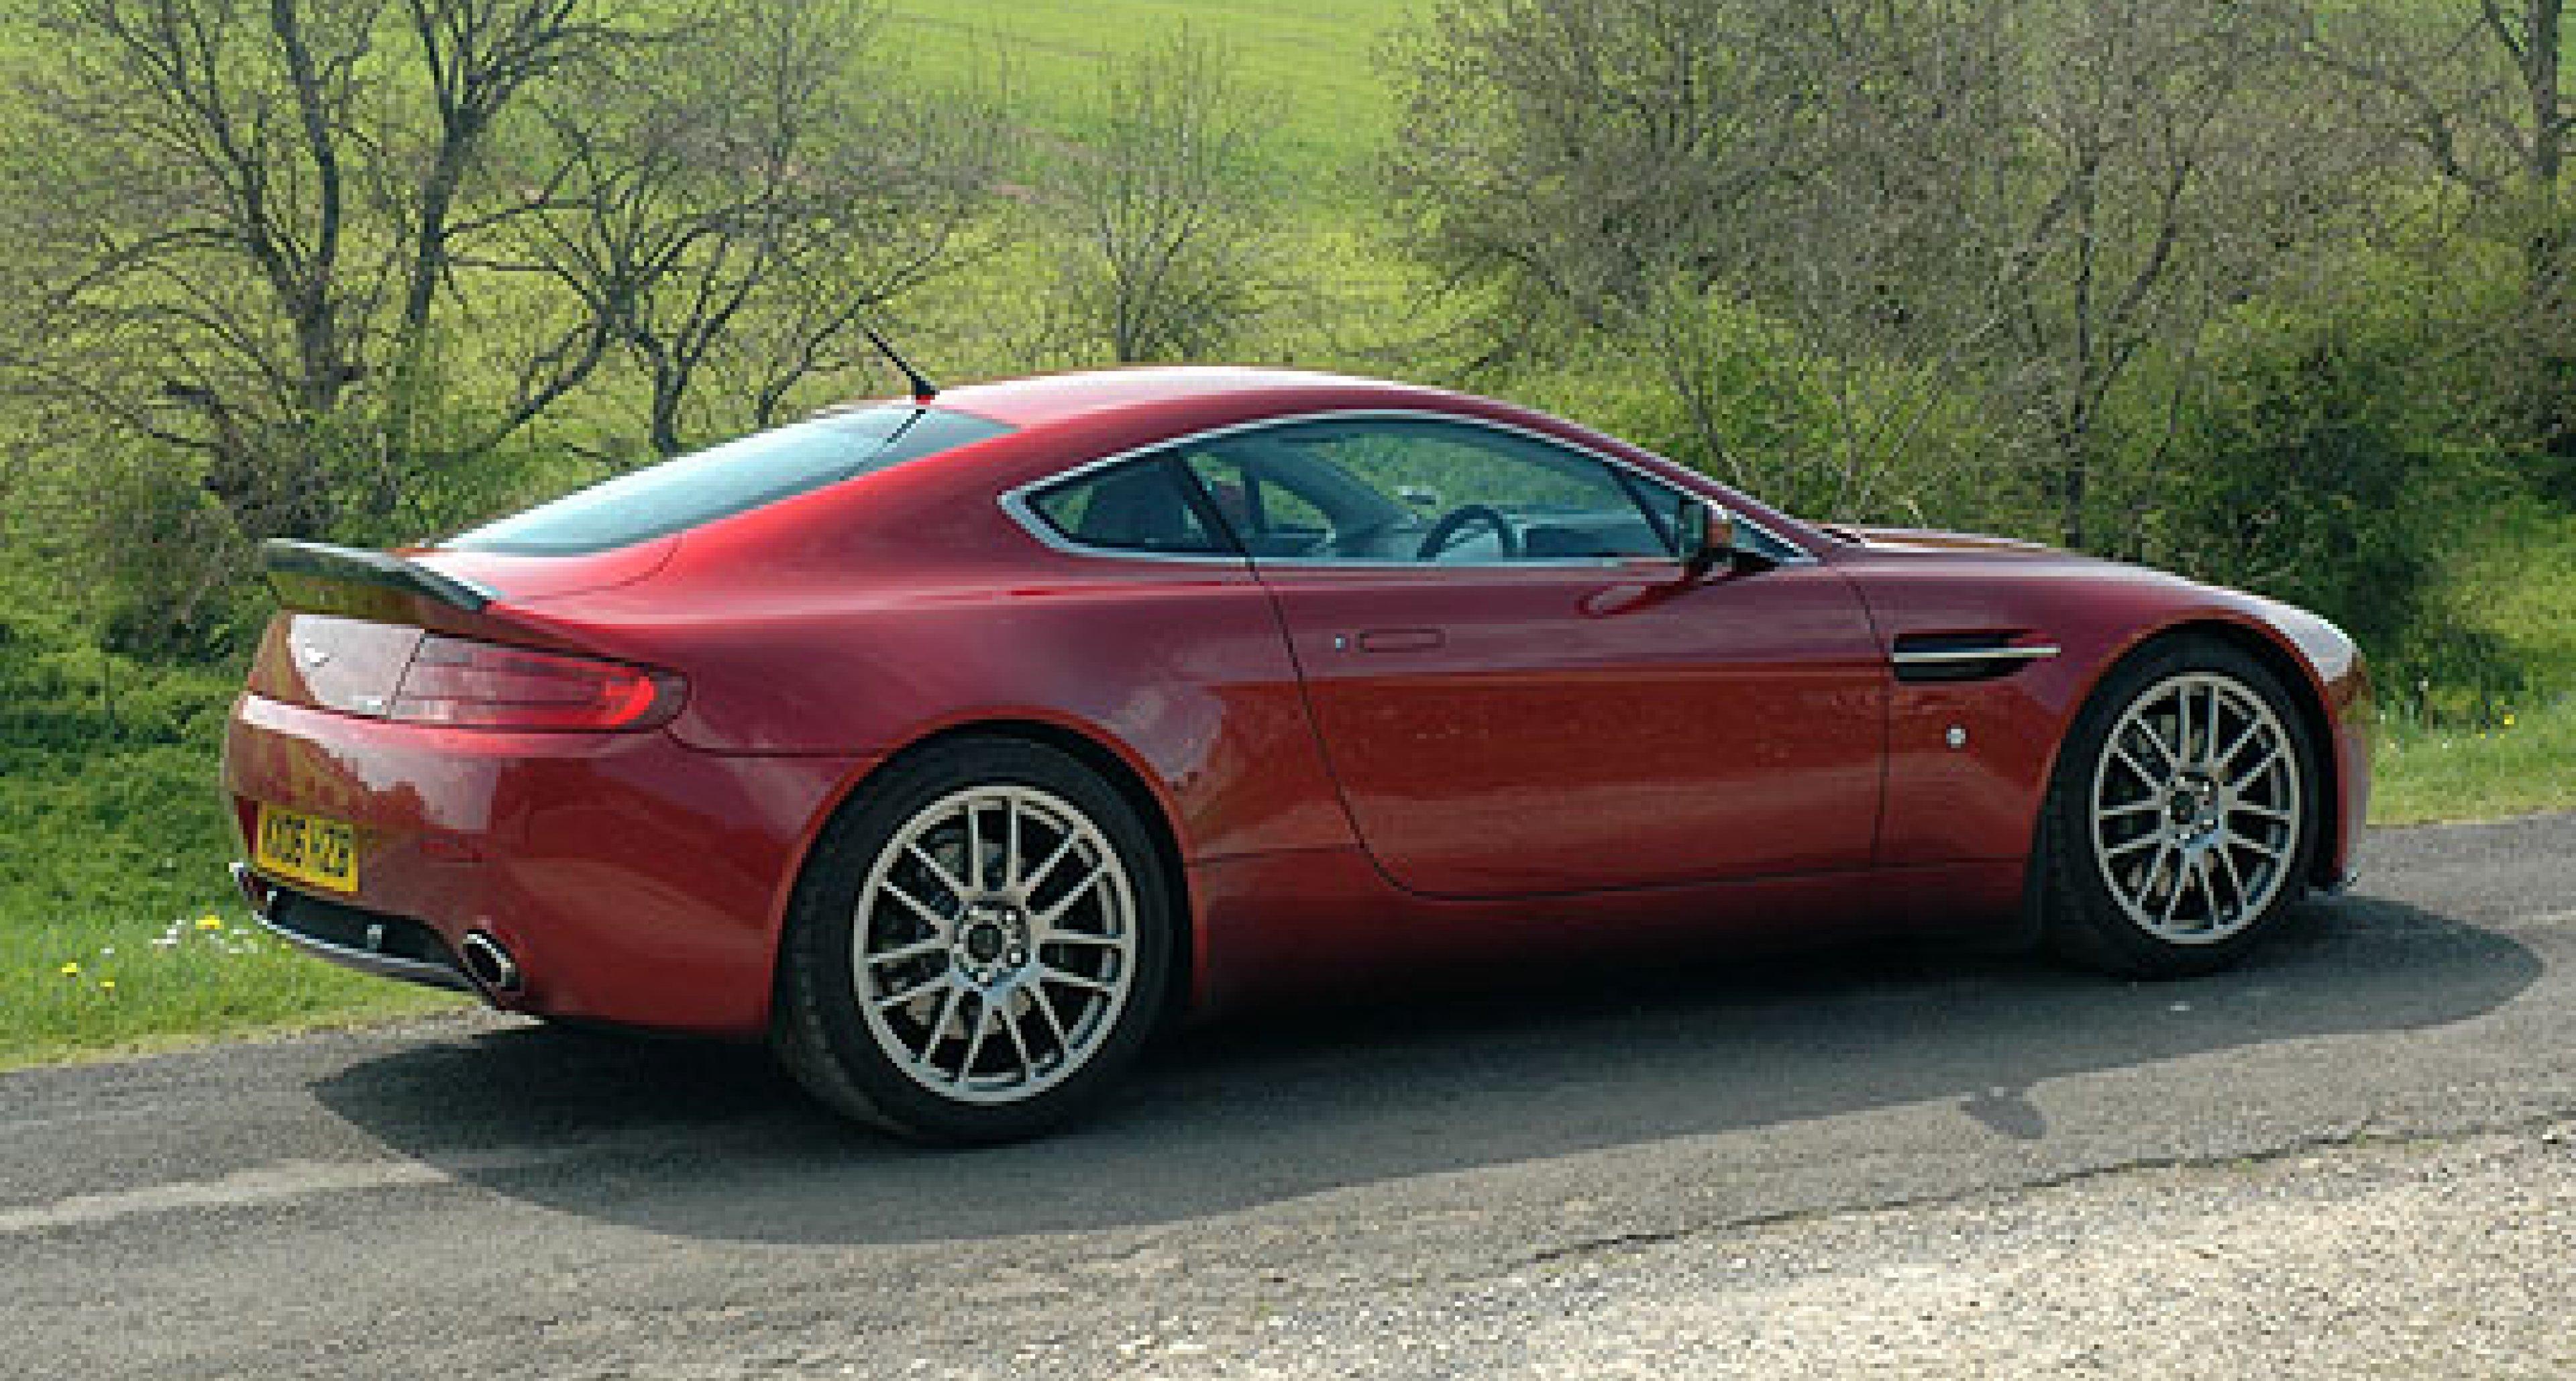 Aston Martin V8 Vantage by Prodrive